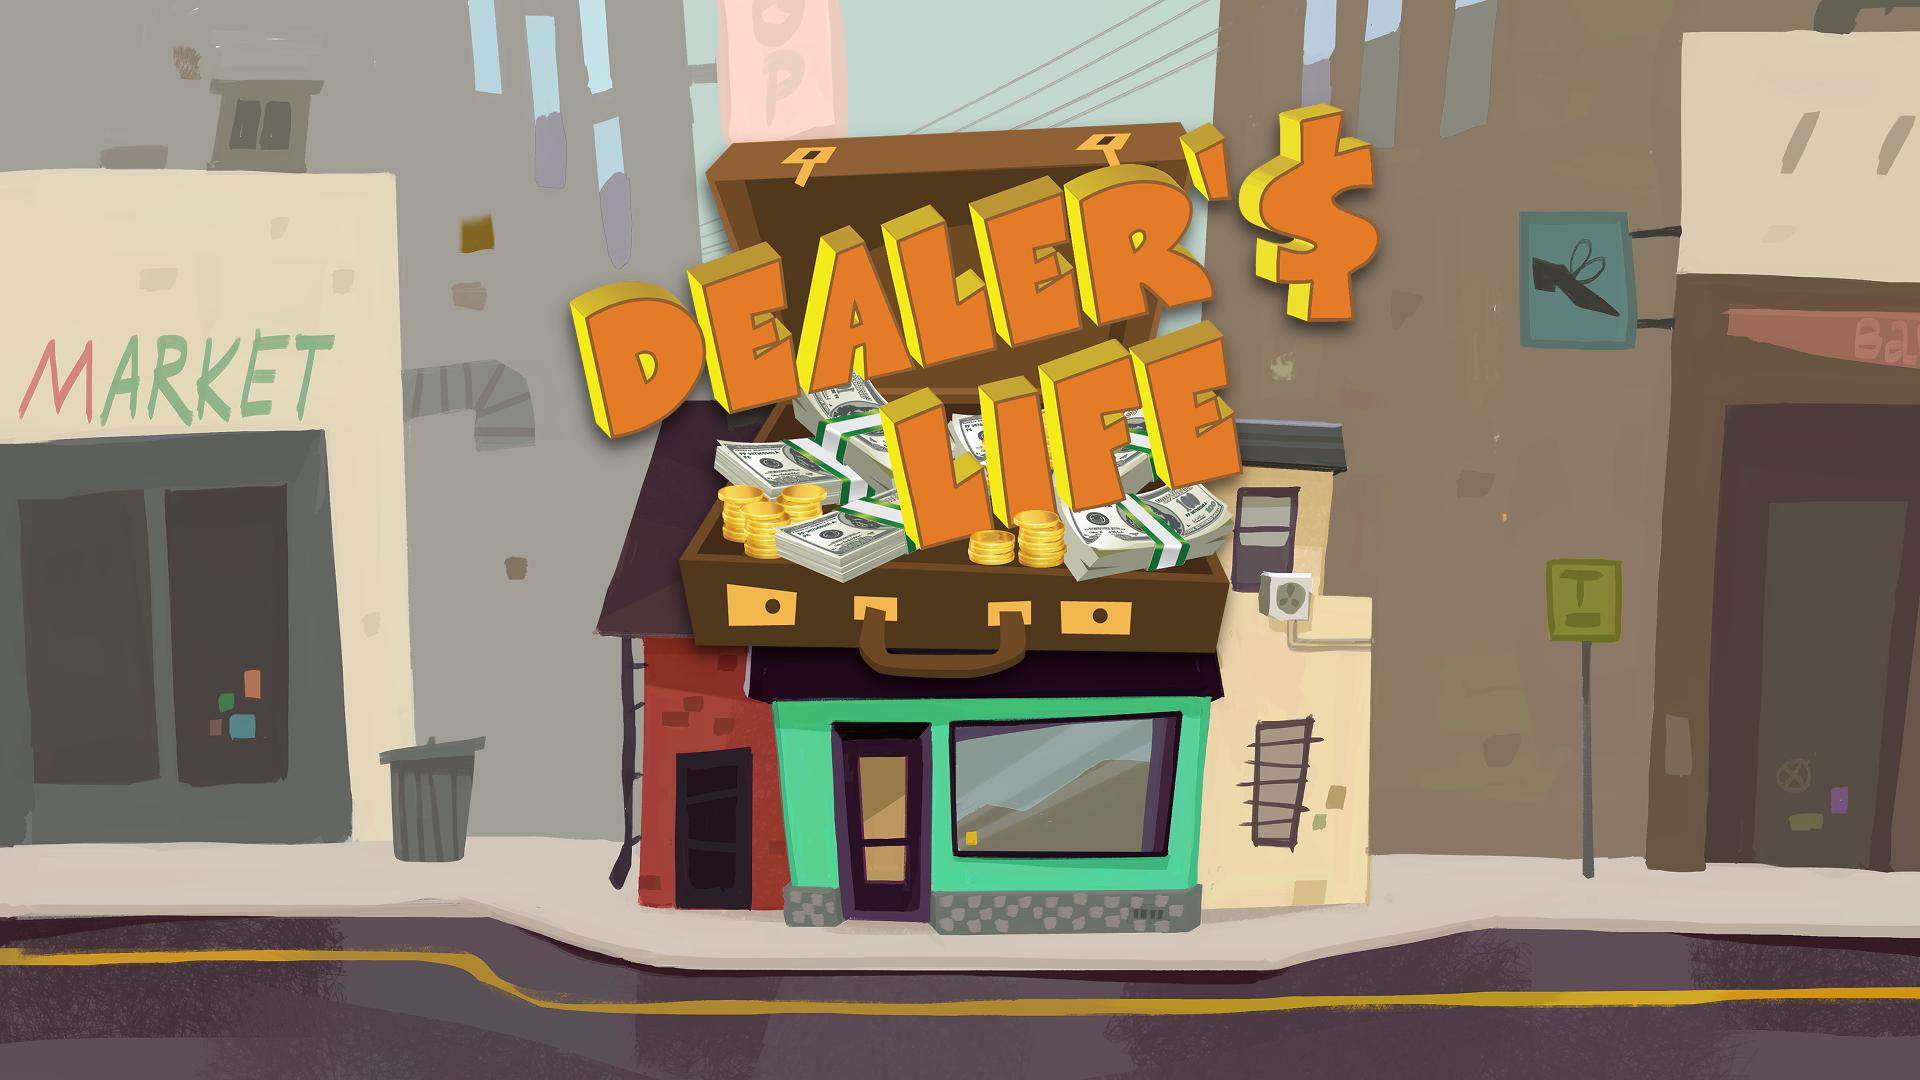 Dealer's Life